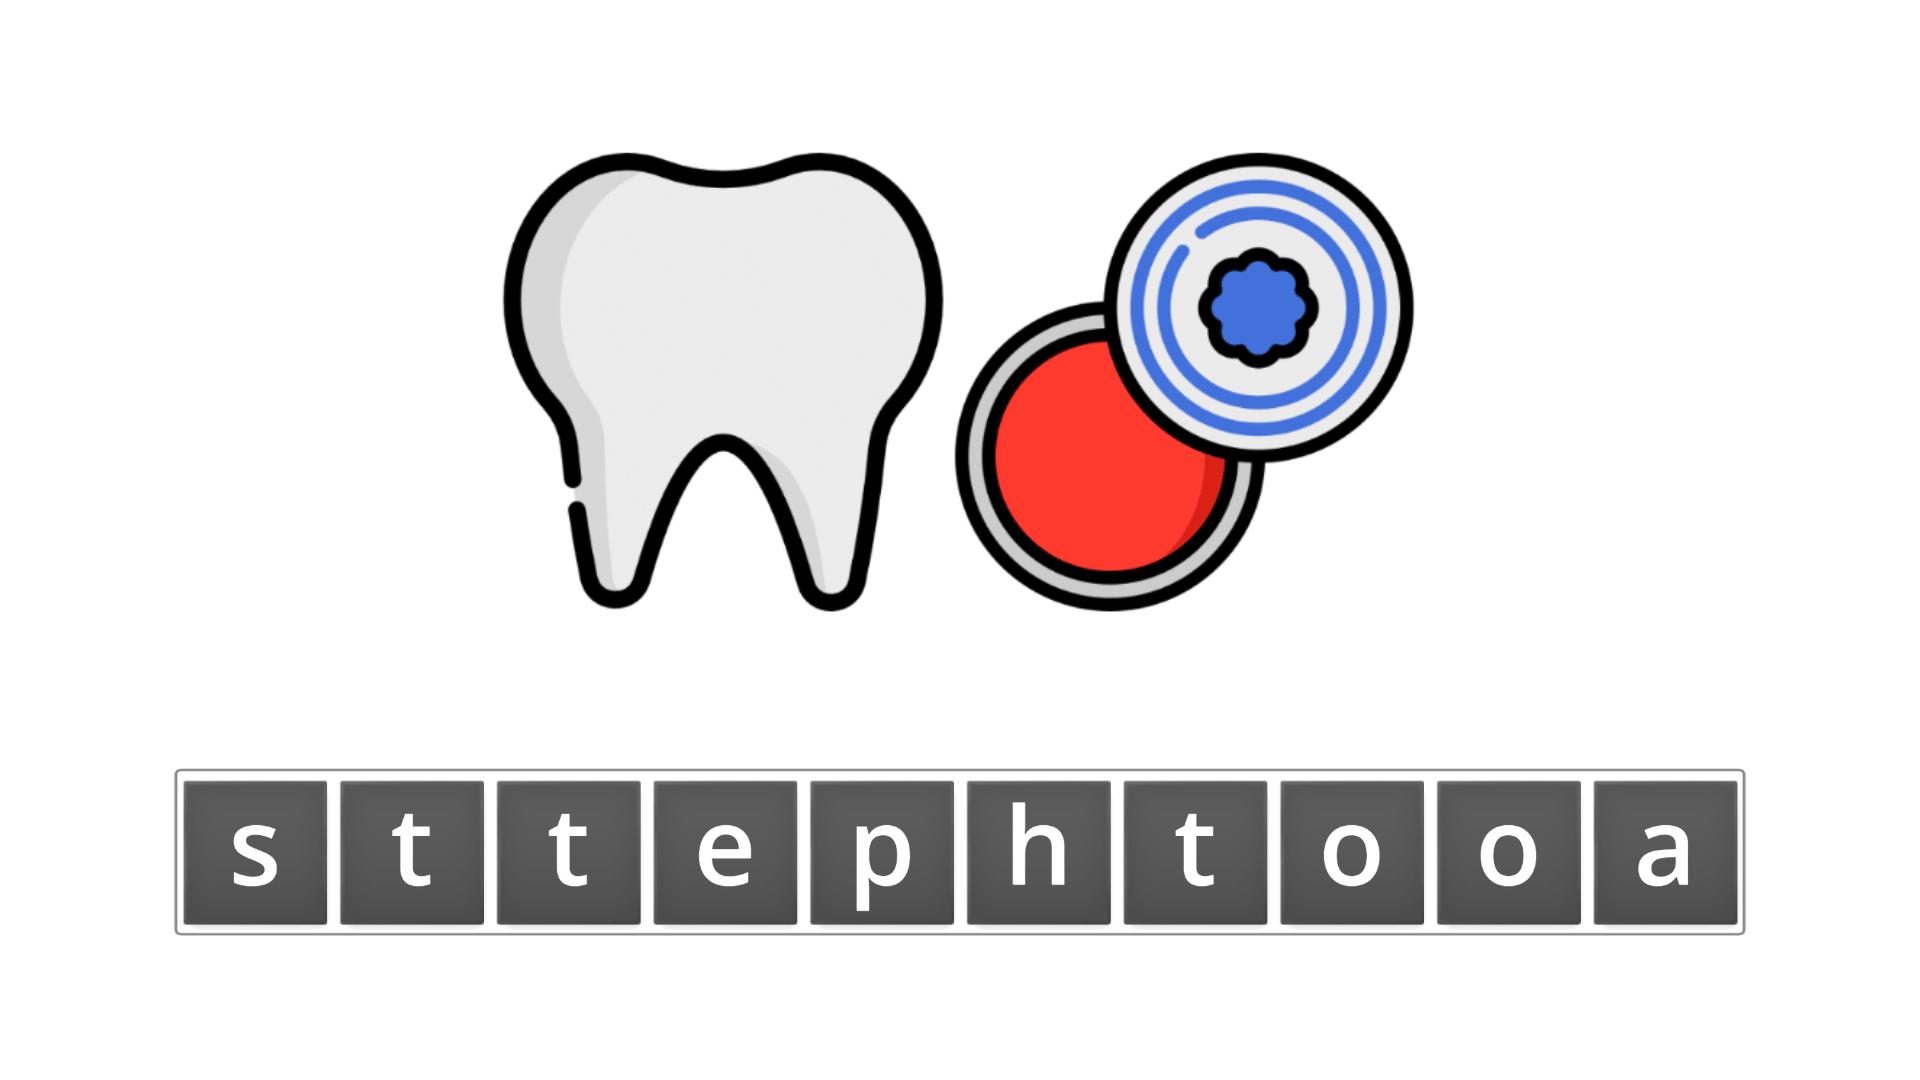 esl resources - flashcards - compound nouns  - unscramble - toothpaste